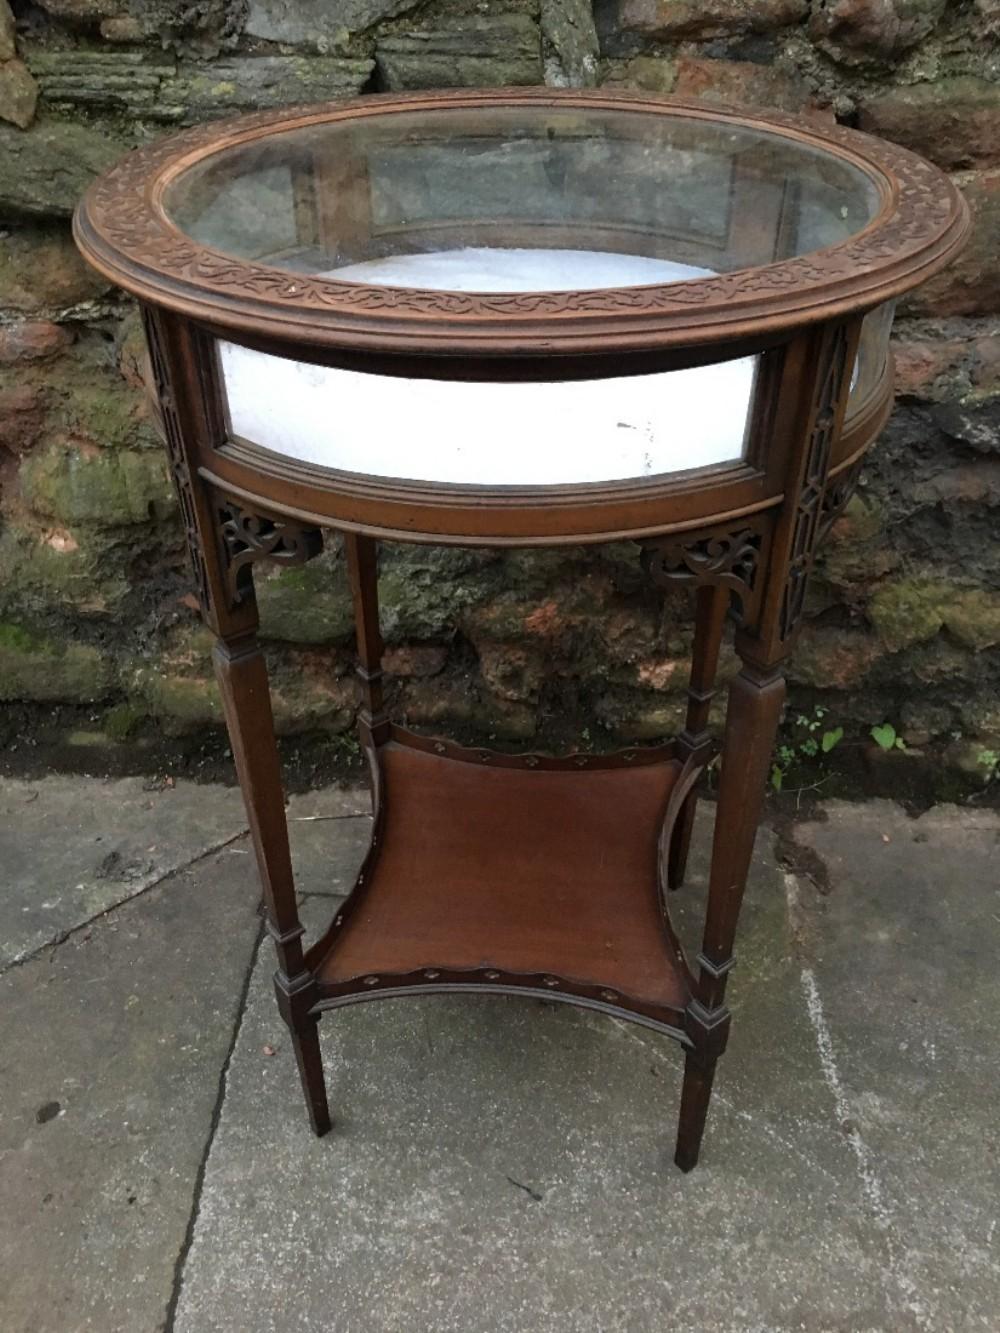 edwardian chippendale style bijouterie table